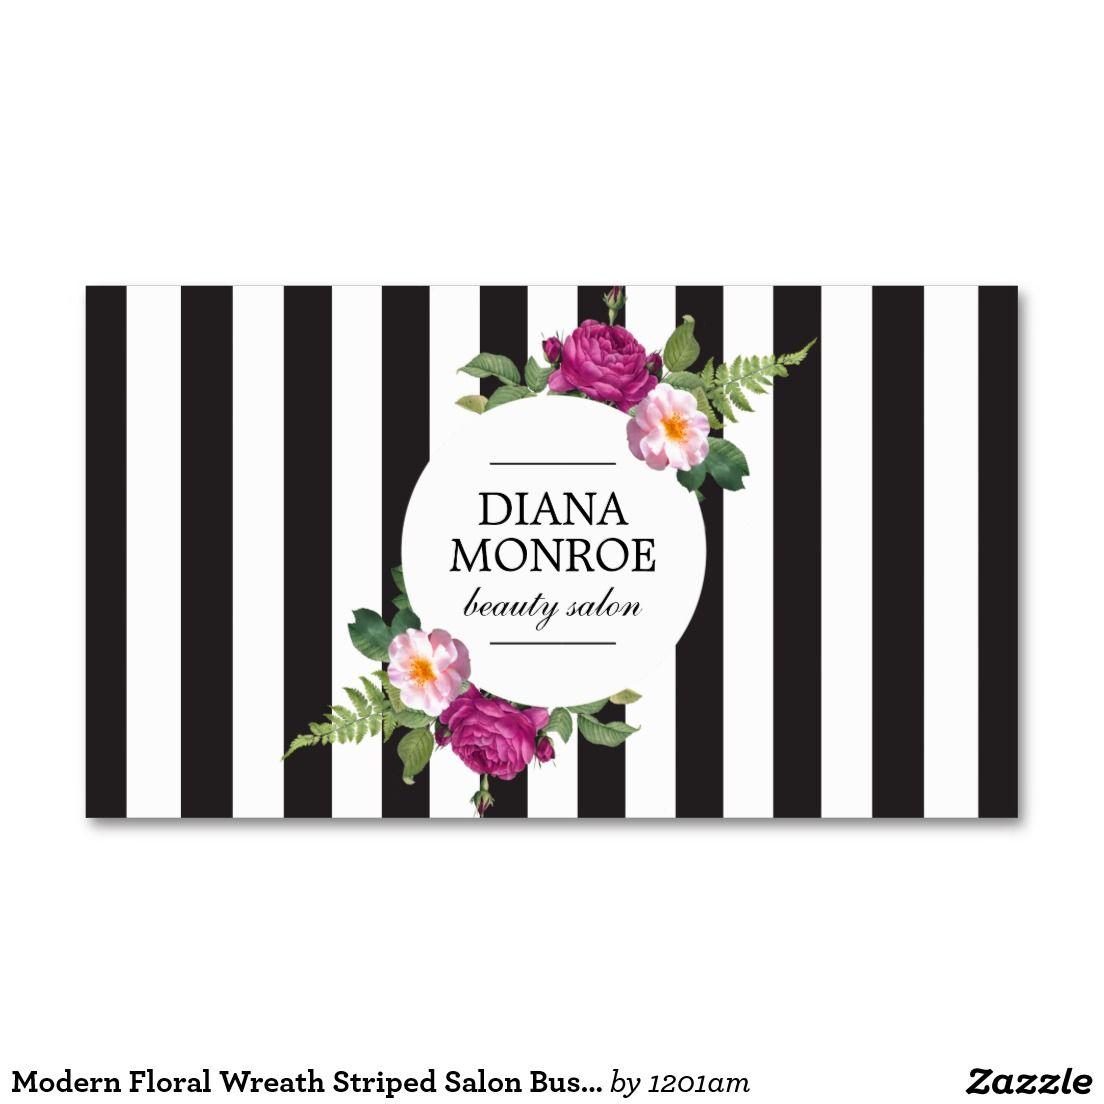 Modern Floral Wreath Striped Salon Business Card Salones